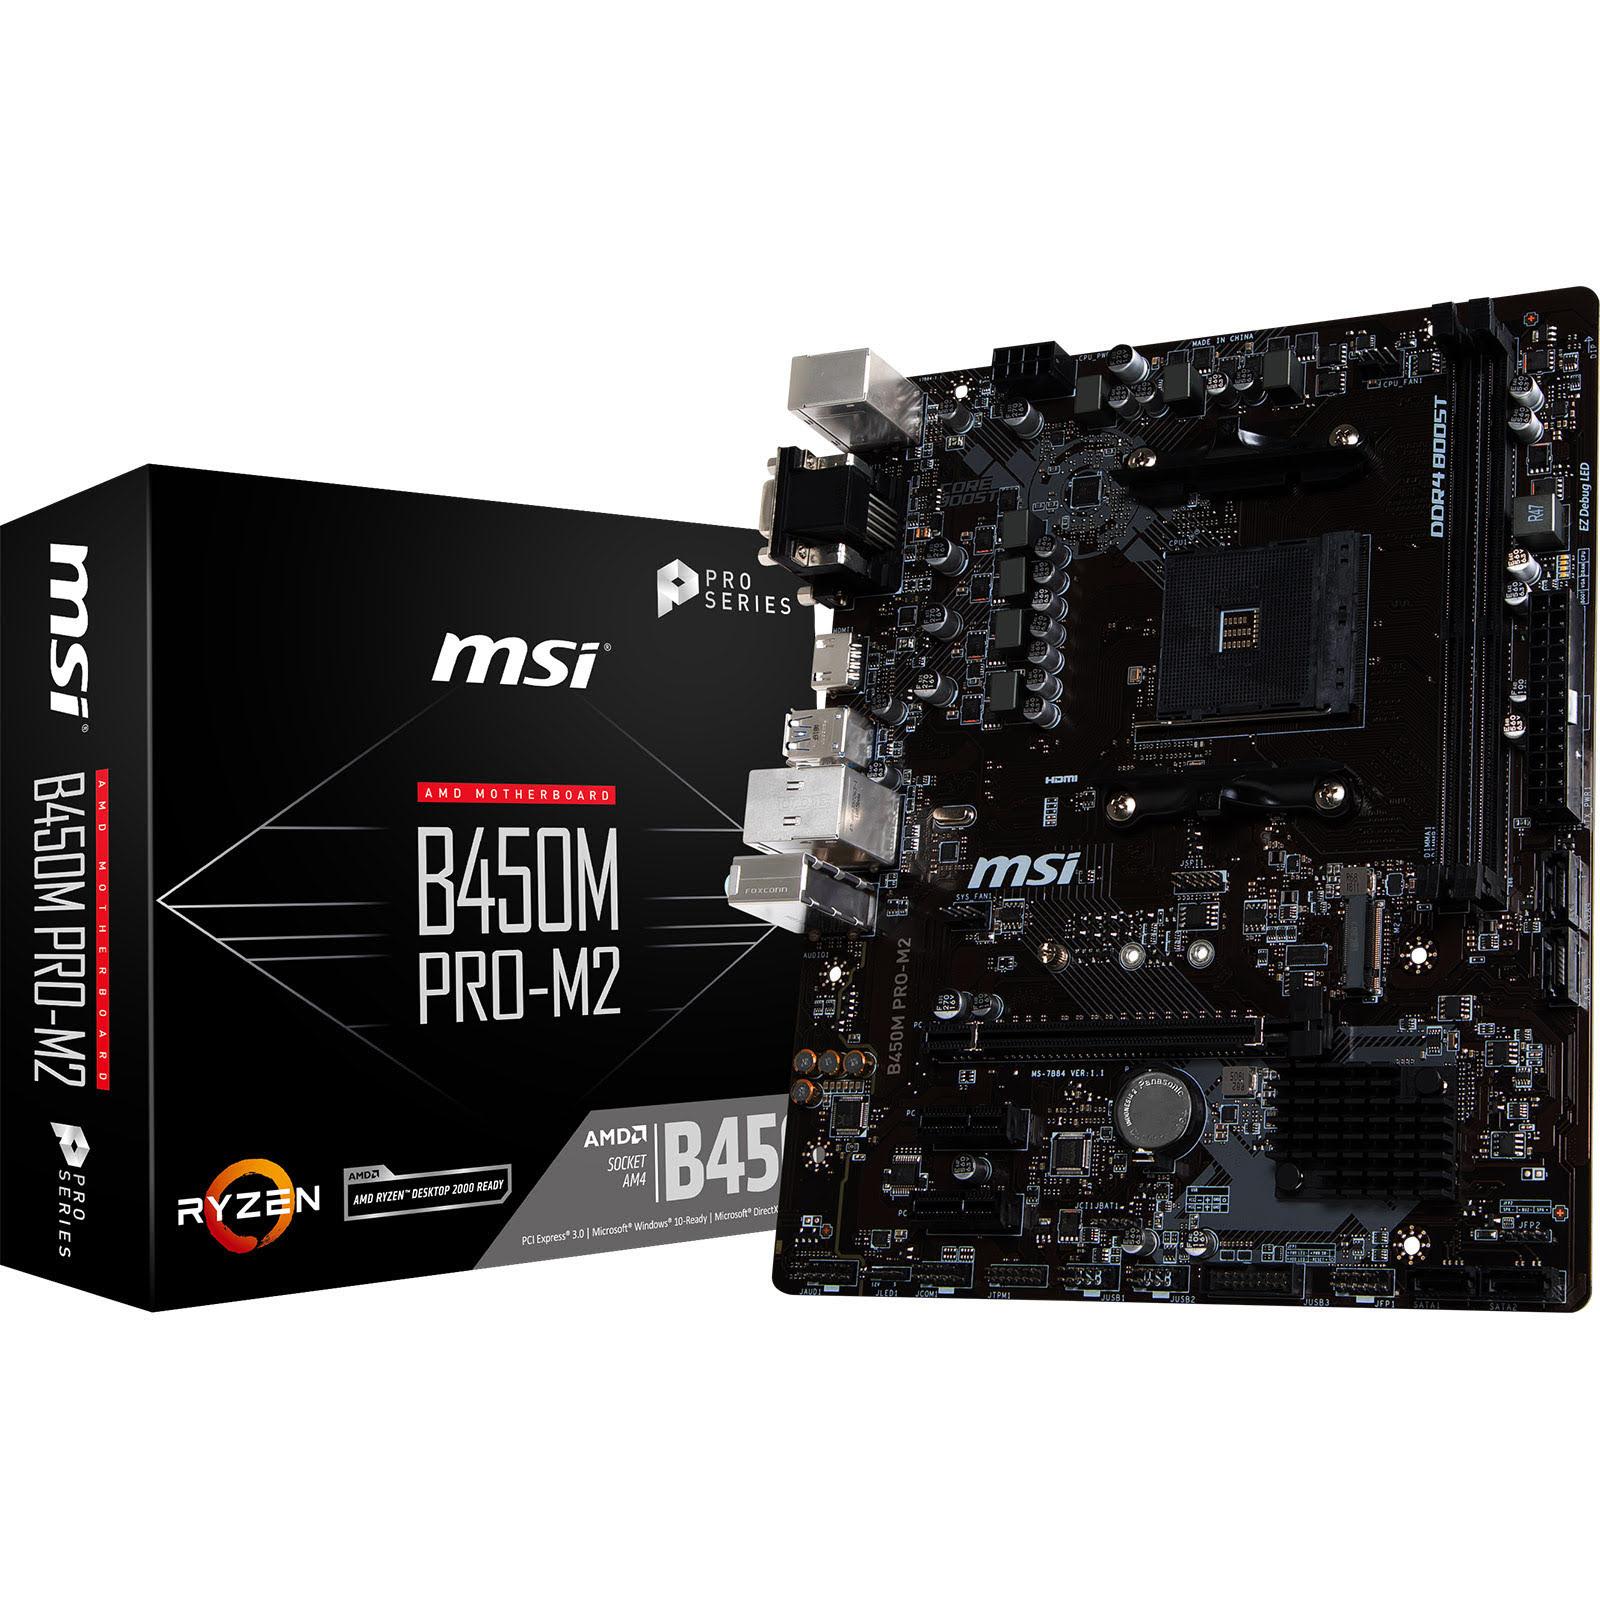 MSI B450M PRO-M2 Micro-ATX DDR4 - Carte mère MSI - Cybertek.fr - 0